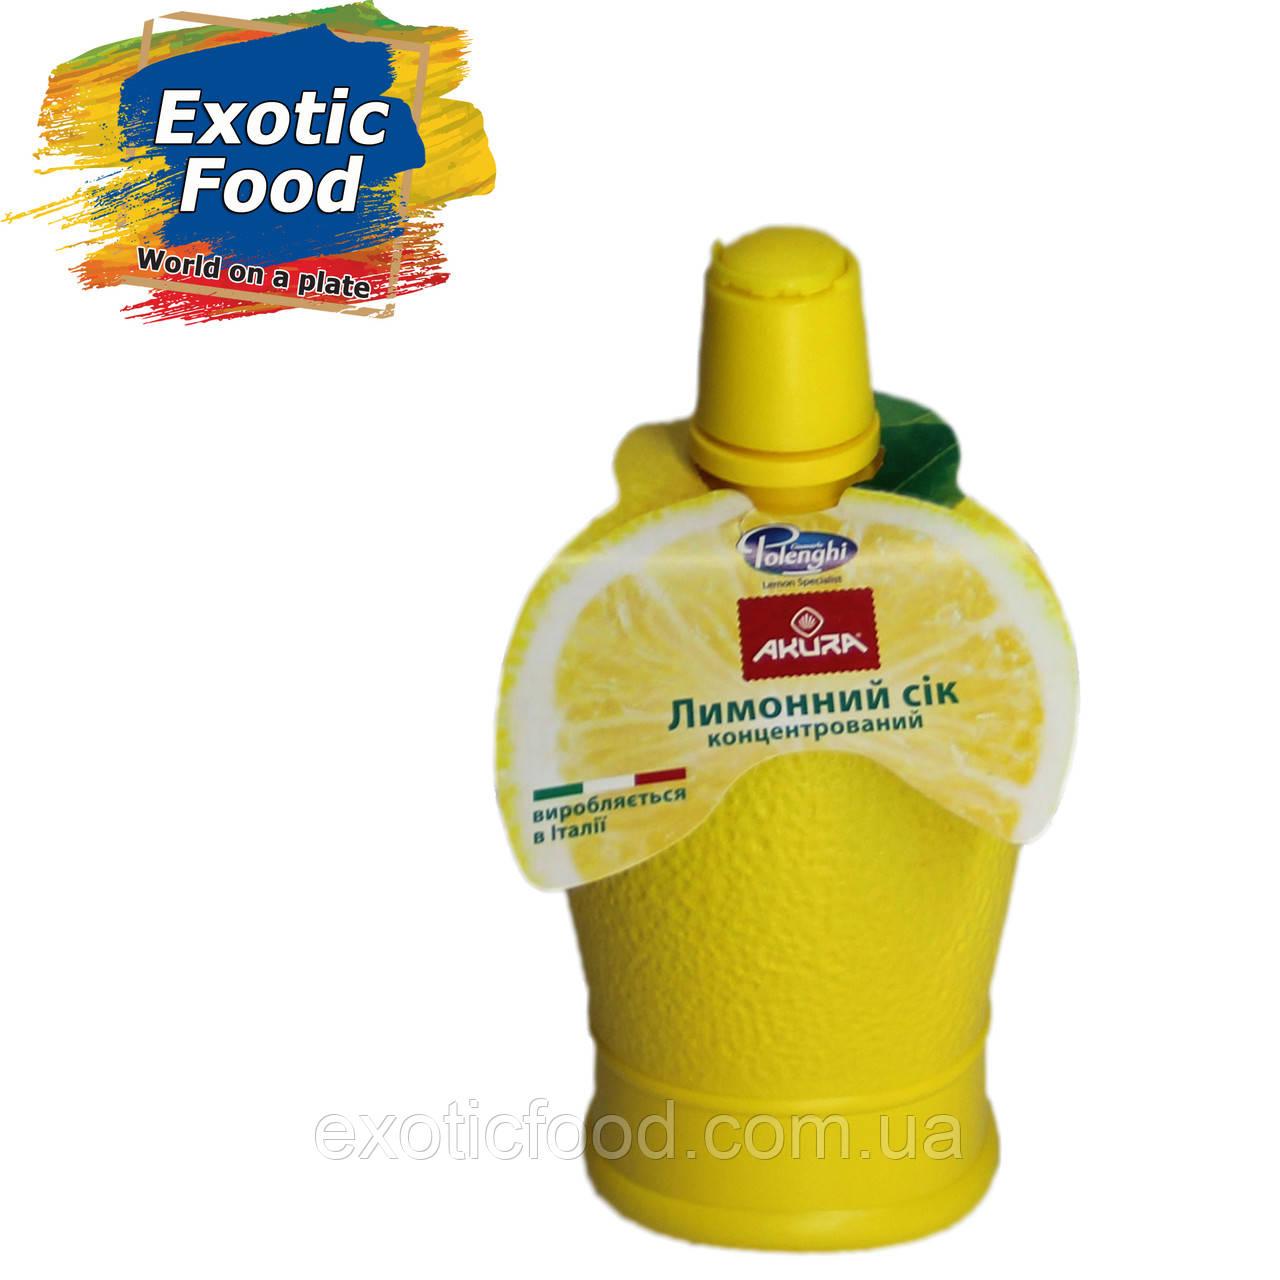 "Лимонный сок концентрированный, 200 мл. ТМ ""AKURA"""